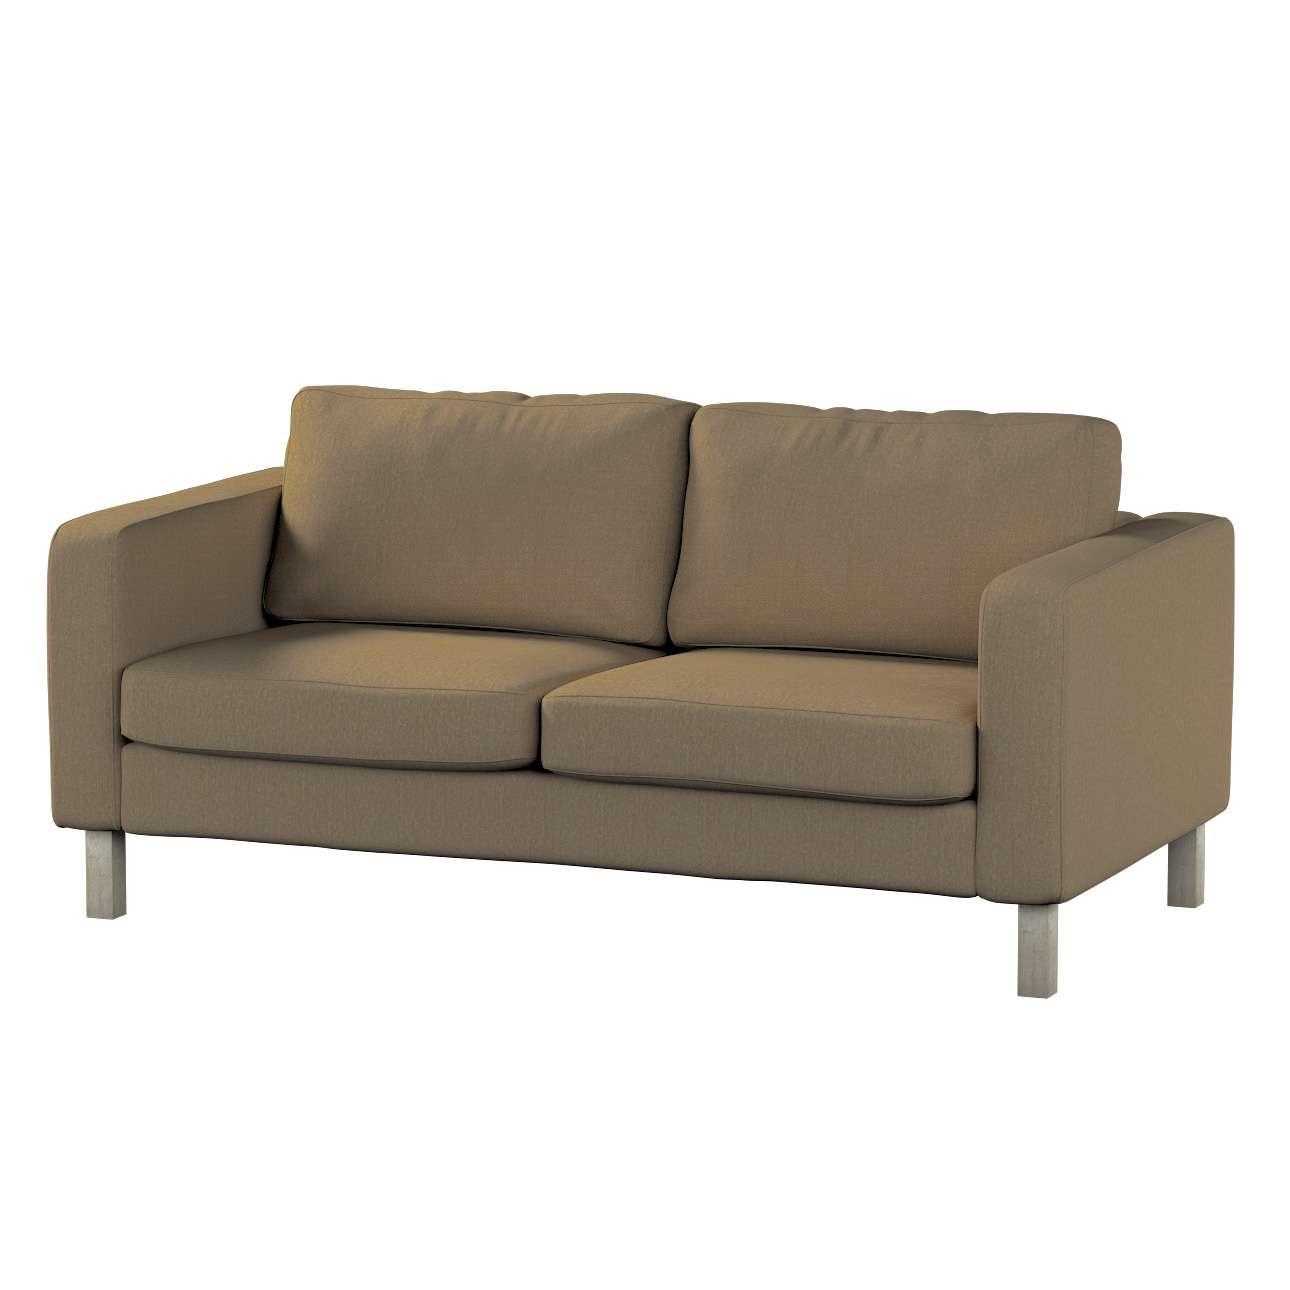 KARSLTAD dvivietės sofos užvalkalas Karlstad 2-vietės sofos užvalkalas kolekcijoje Chenille, audinys: 702-21